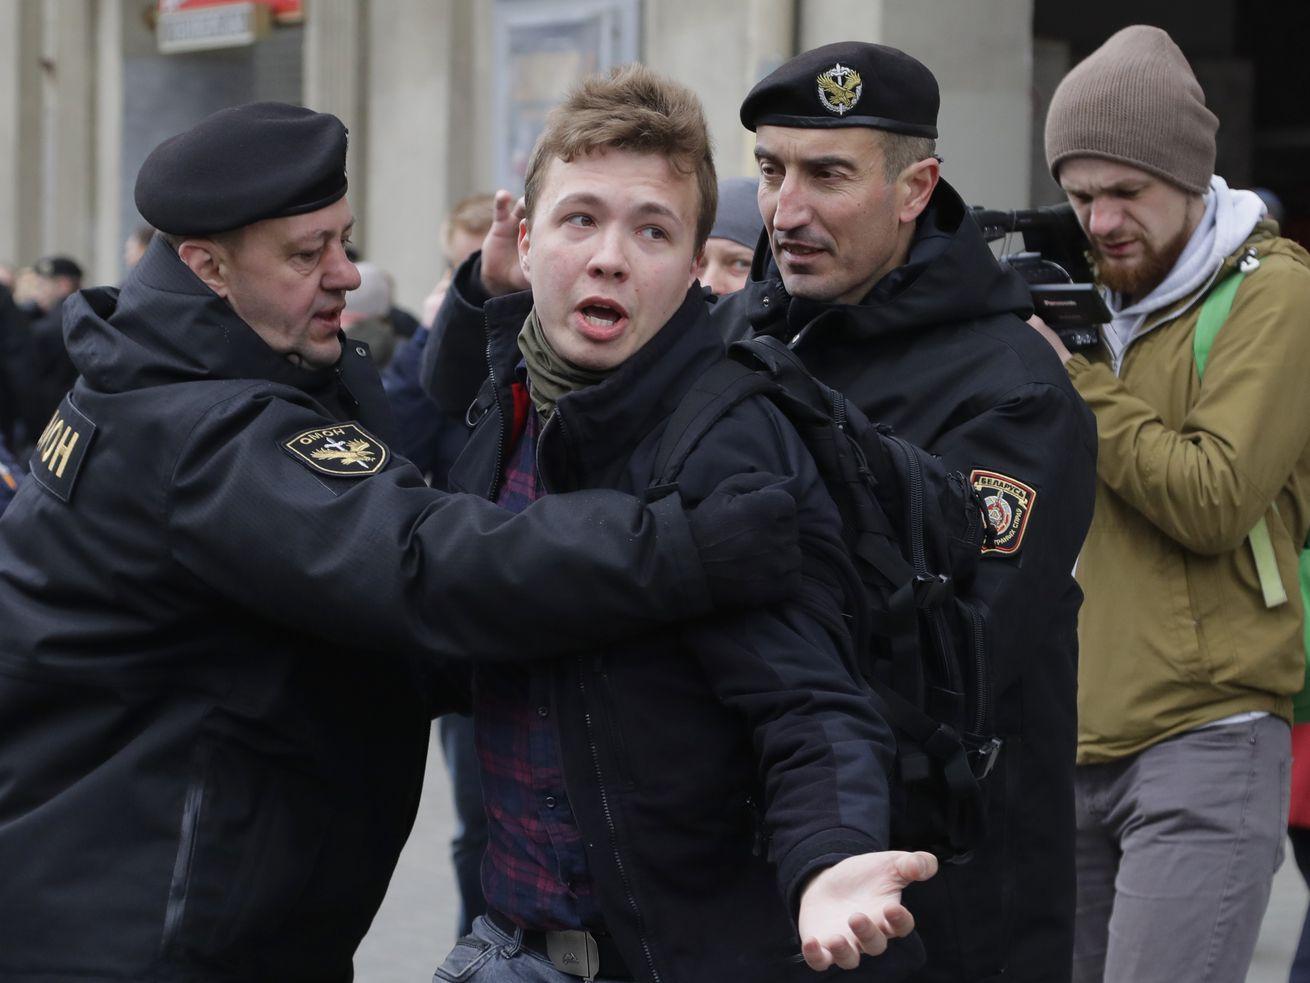 In this Sunday, March 26, 2017 file photo, Belarus police detain journalist Raman Pratasevich, center, in Minsk, Belarus.